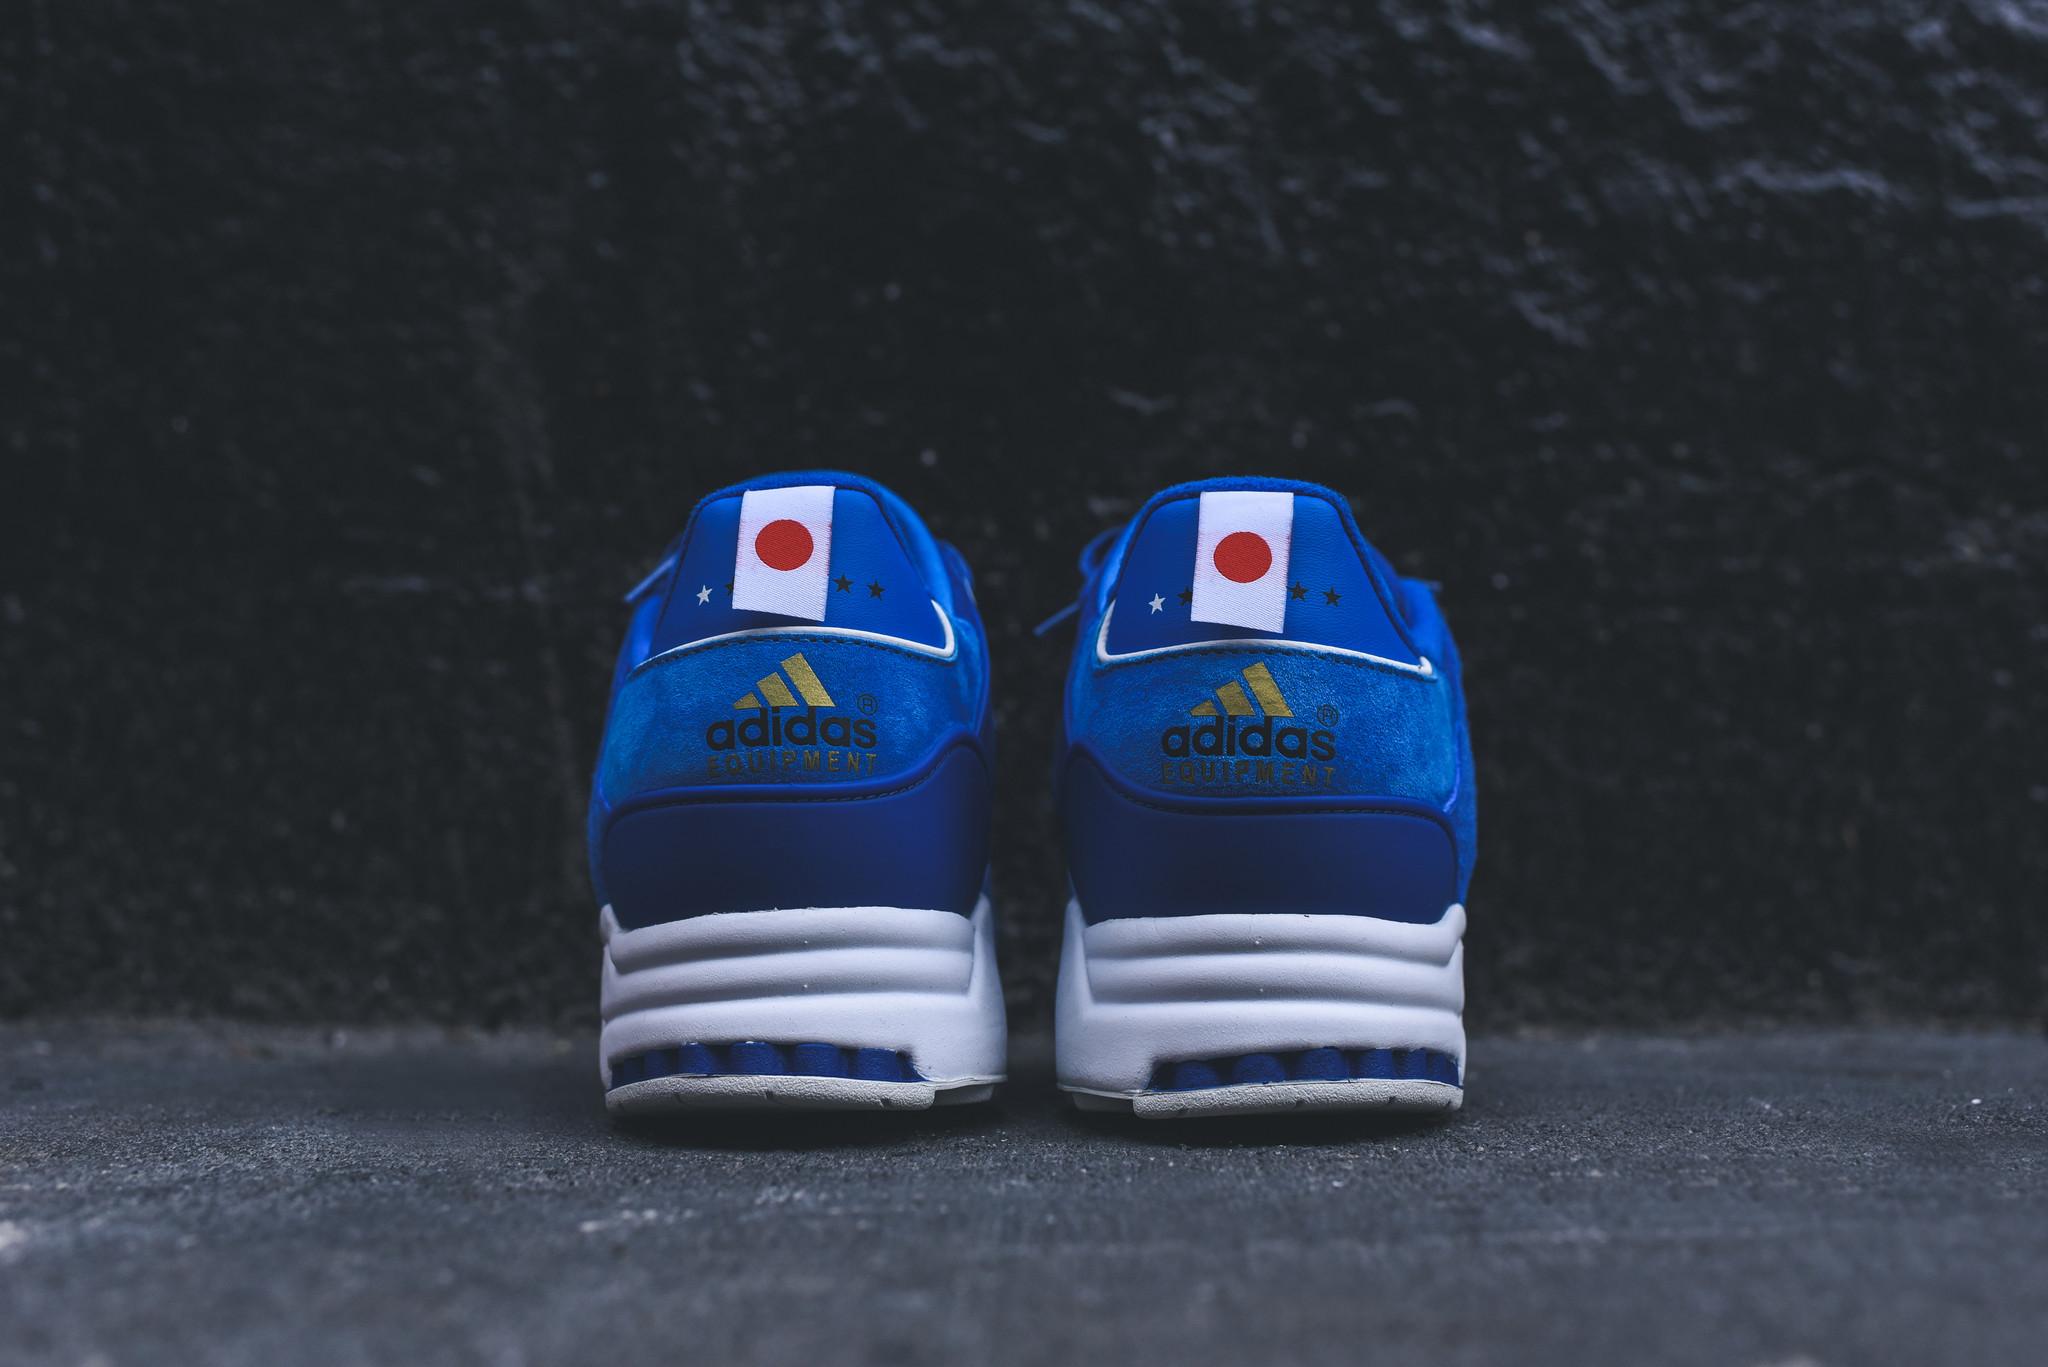 adidas japon 2